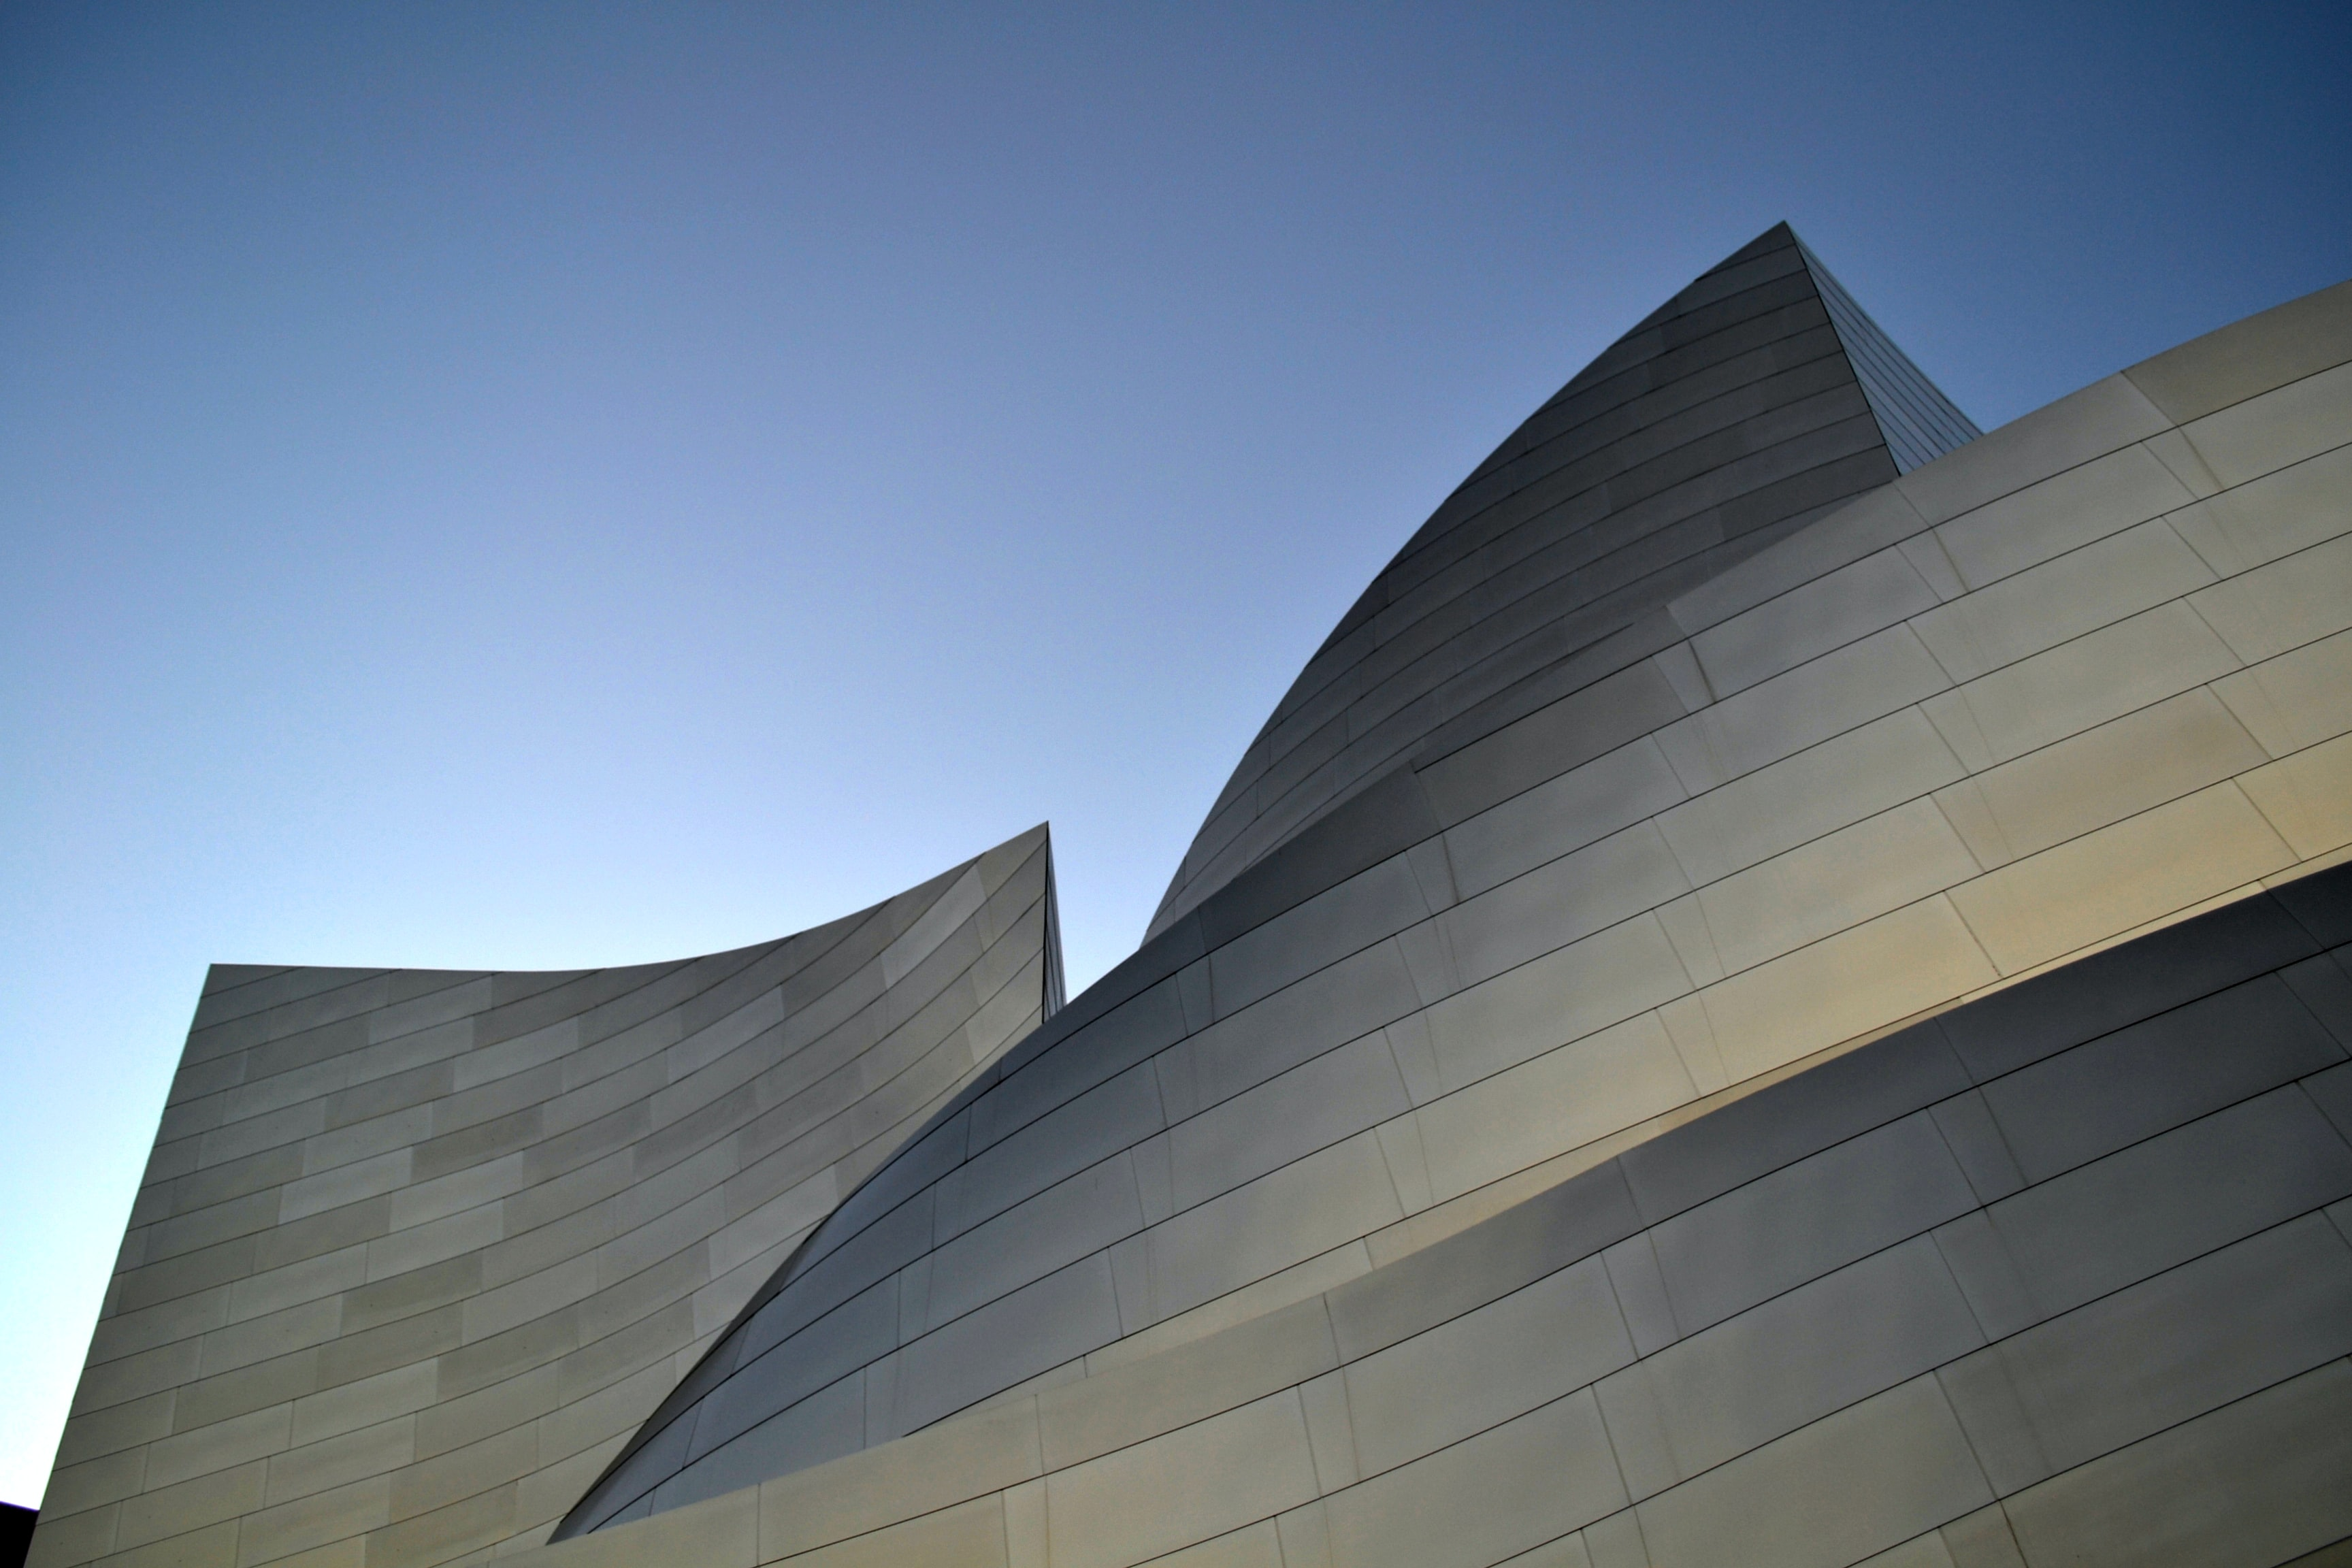 Steel panels in the postmodern facade of the Walt Disney Concert Hall